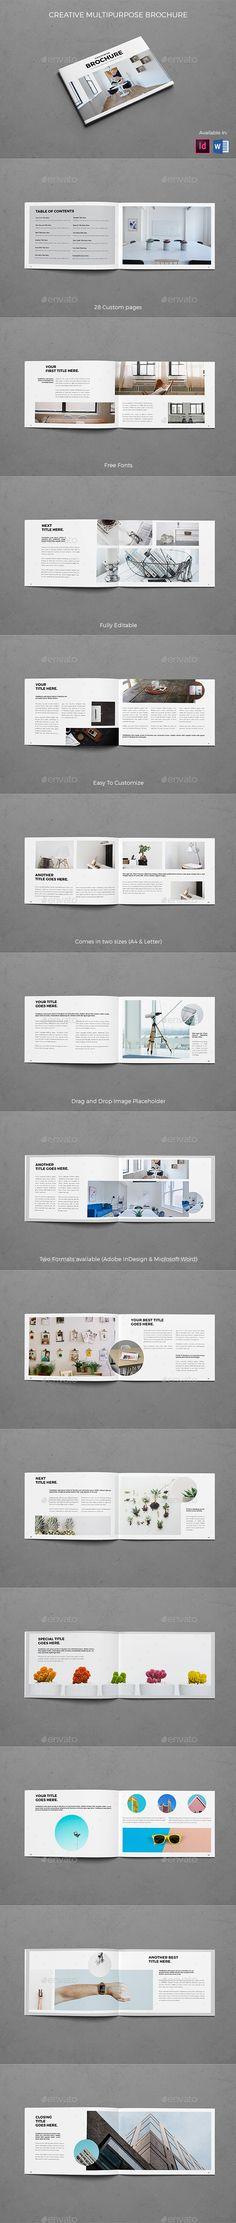 Landscape Creative Multipurpose Brochure - #Brochures Print Templates Download here: https://graphicriver.net/item/landscape-creative-multipurpose-brochure/19626811?ref=alena994